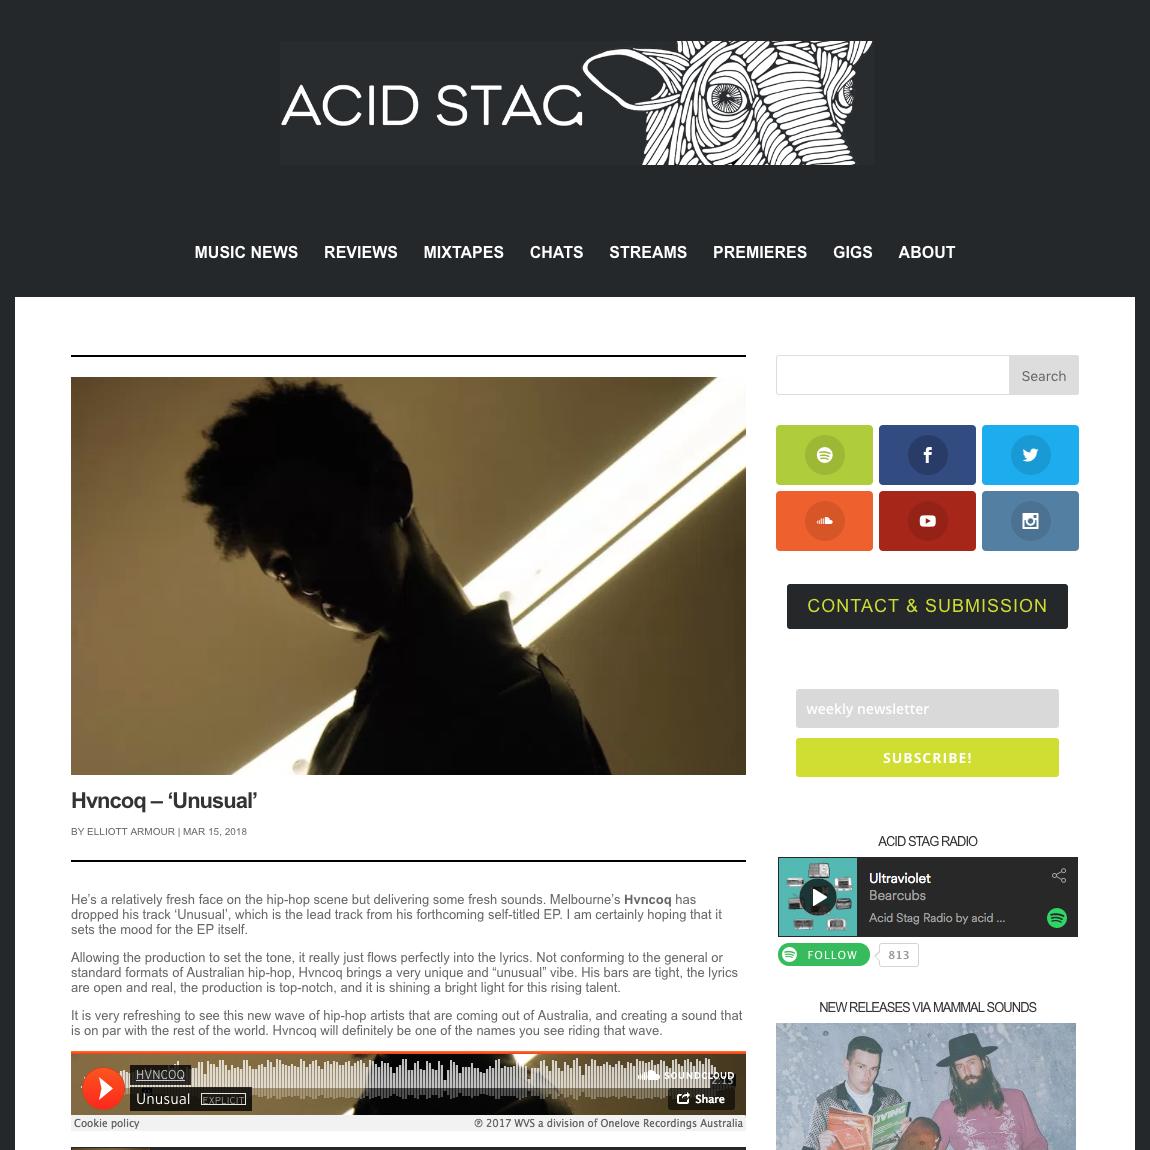 Acid Stag - March 15th 2018